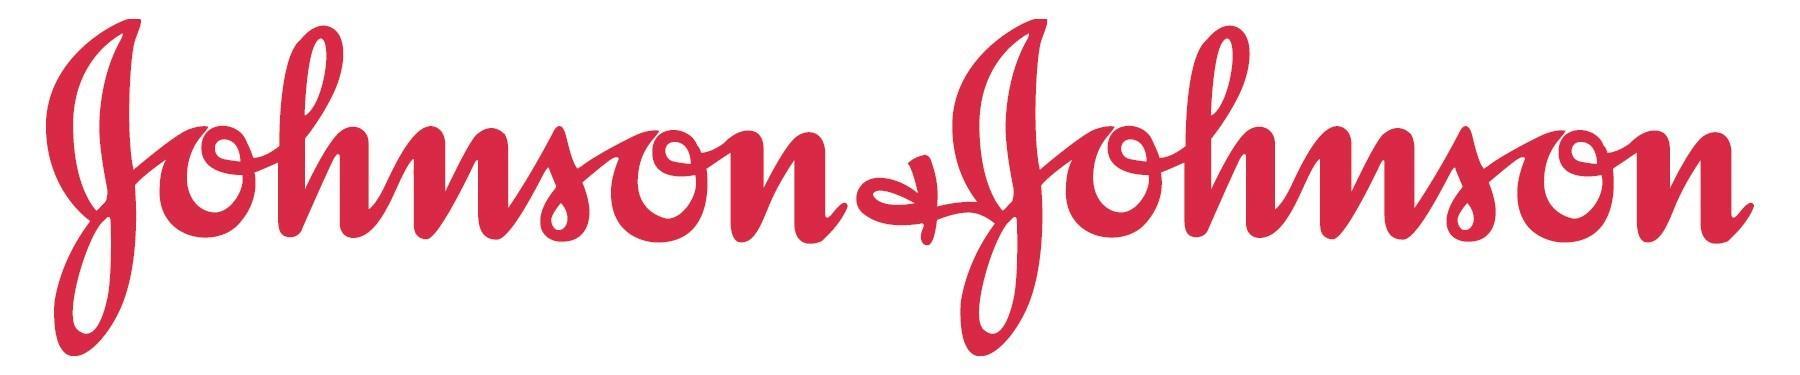 logo-johnsonandjohnson